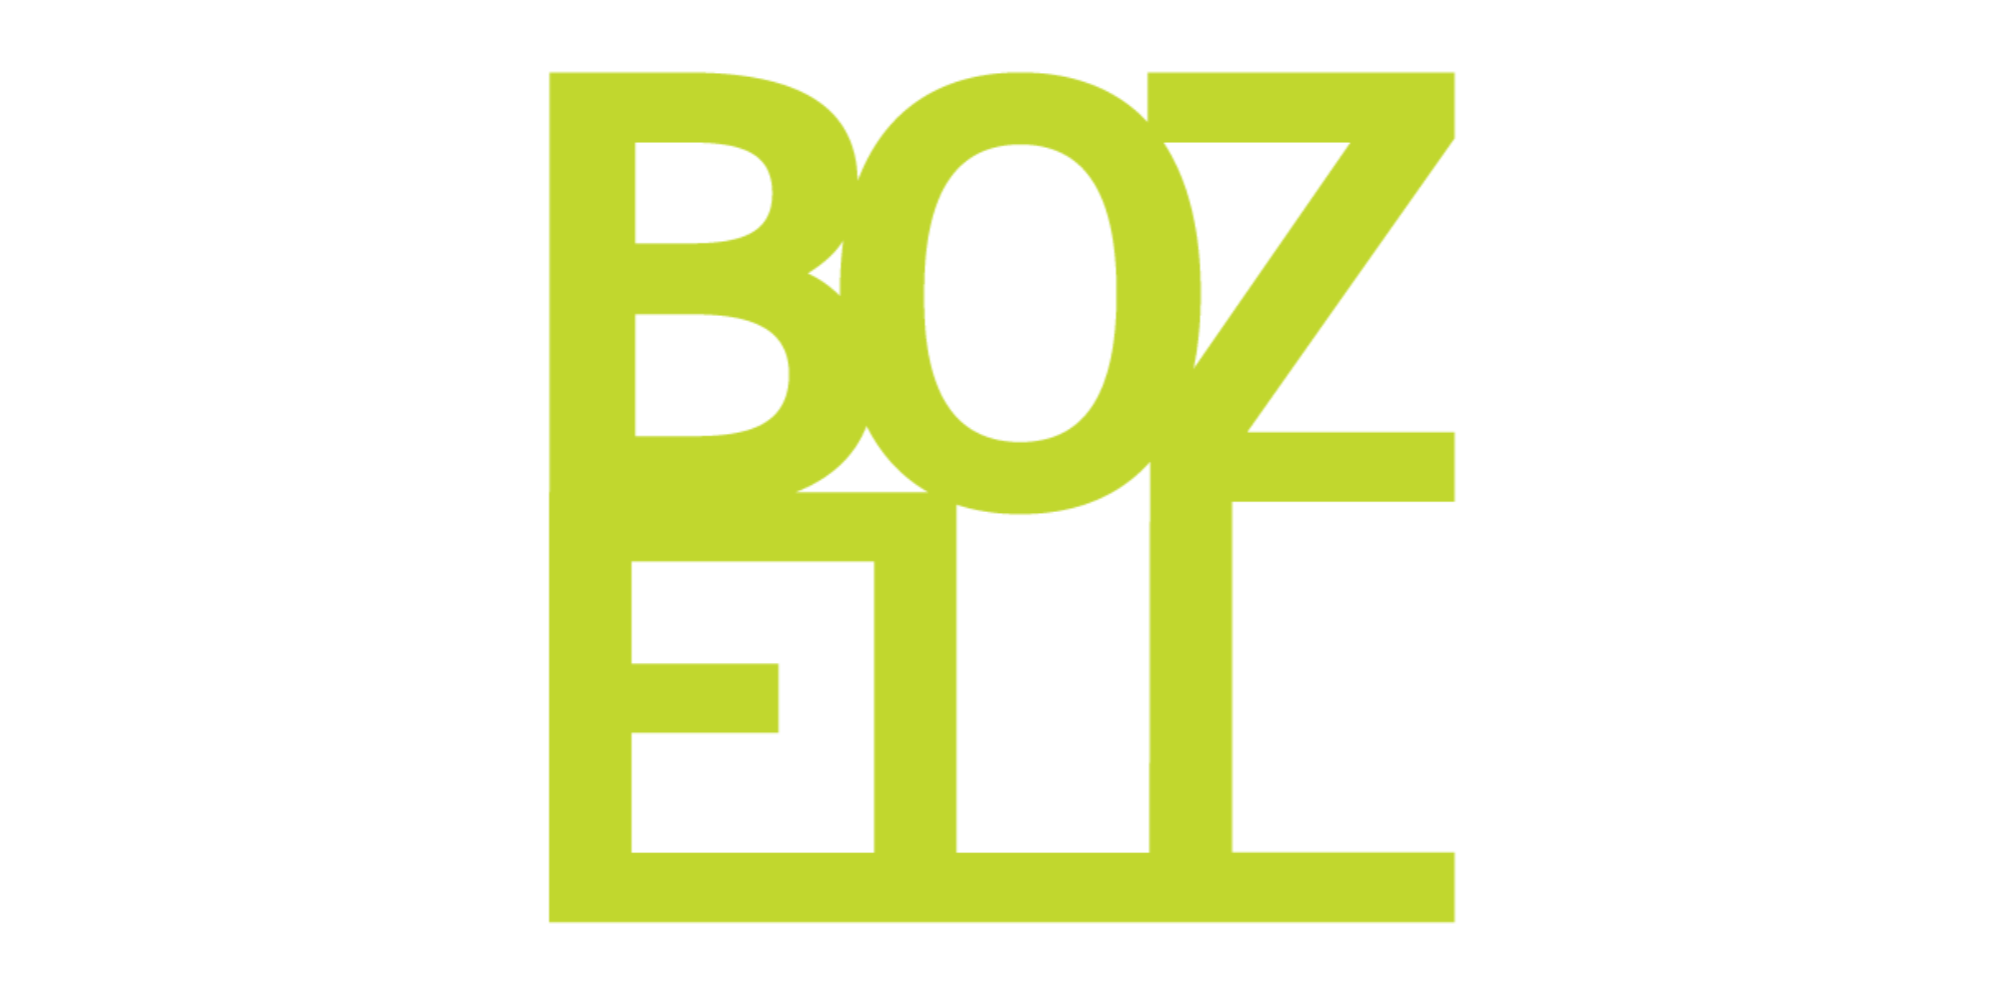 Bozell